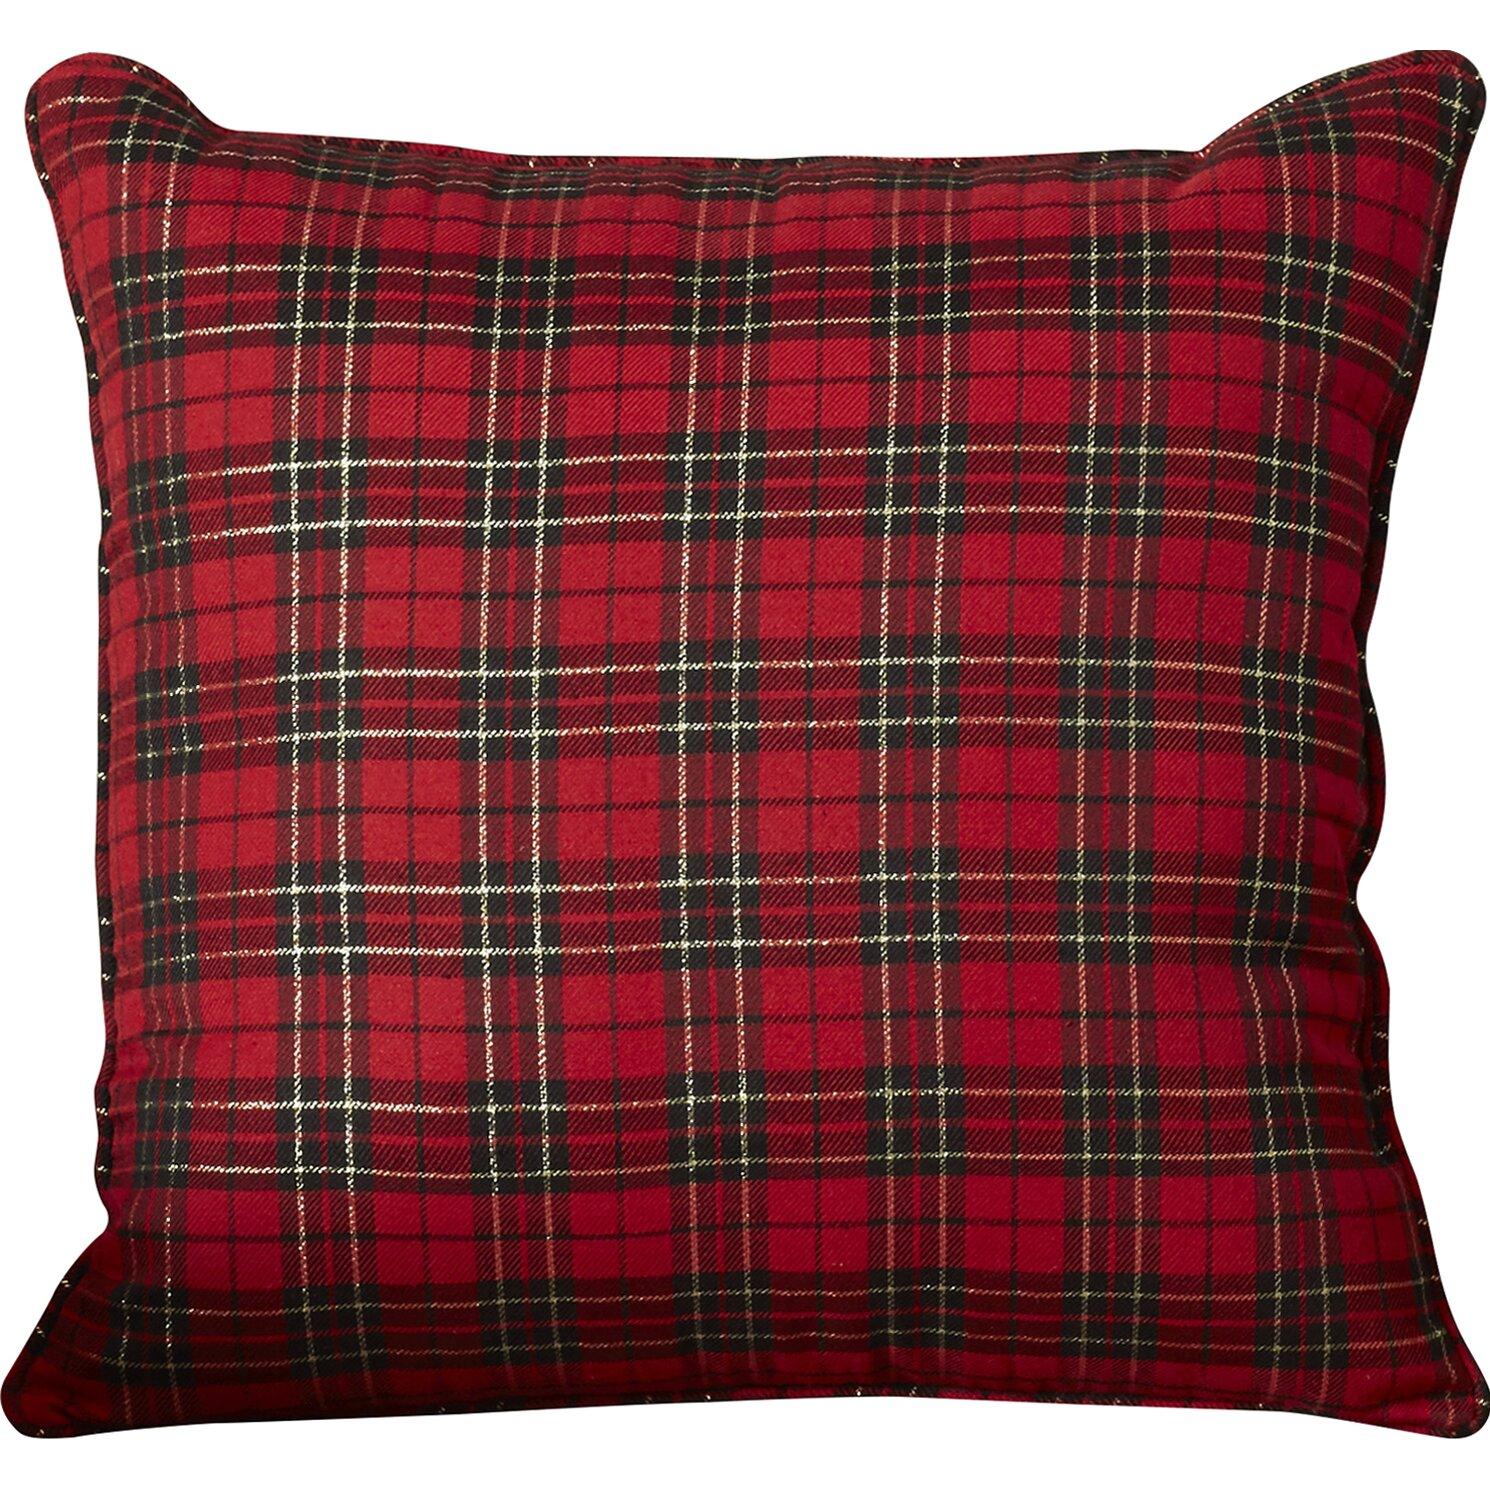 Loon Peak Greeley Holiday Plaid Throw Pillow & Reviews Wayfair